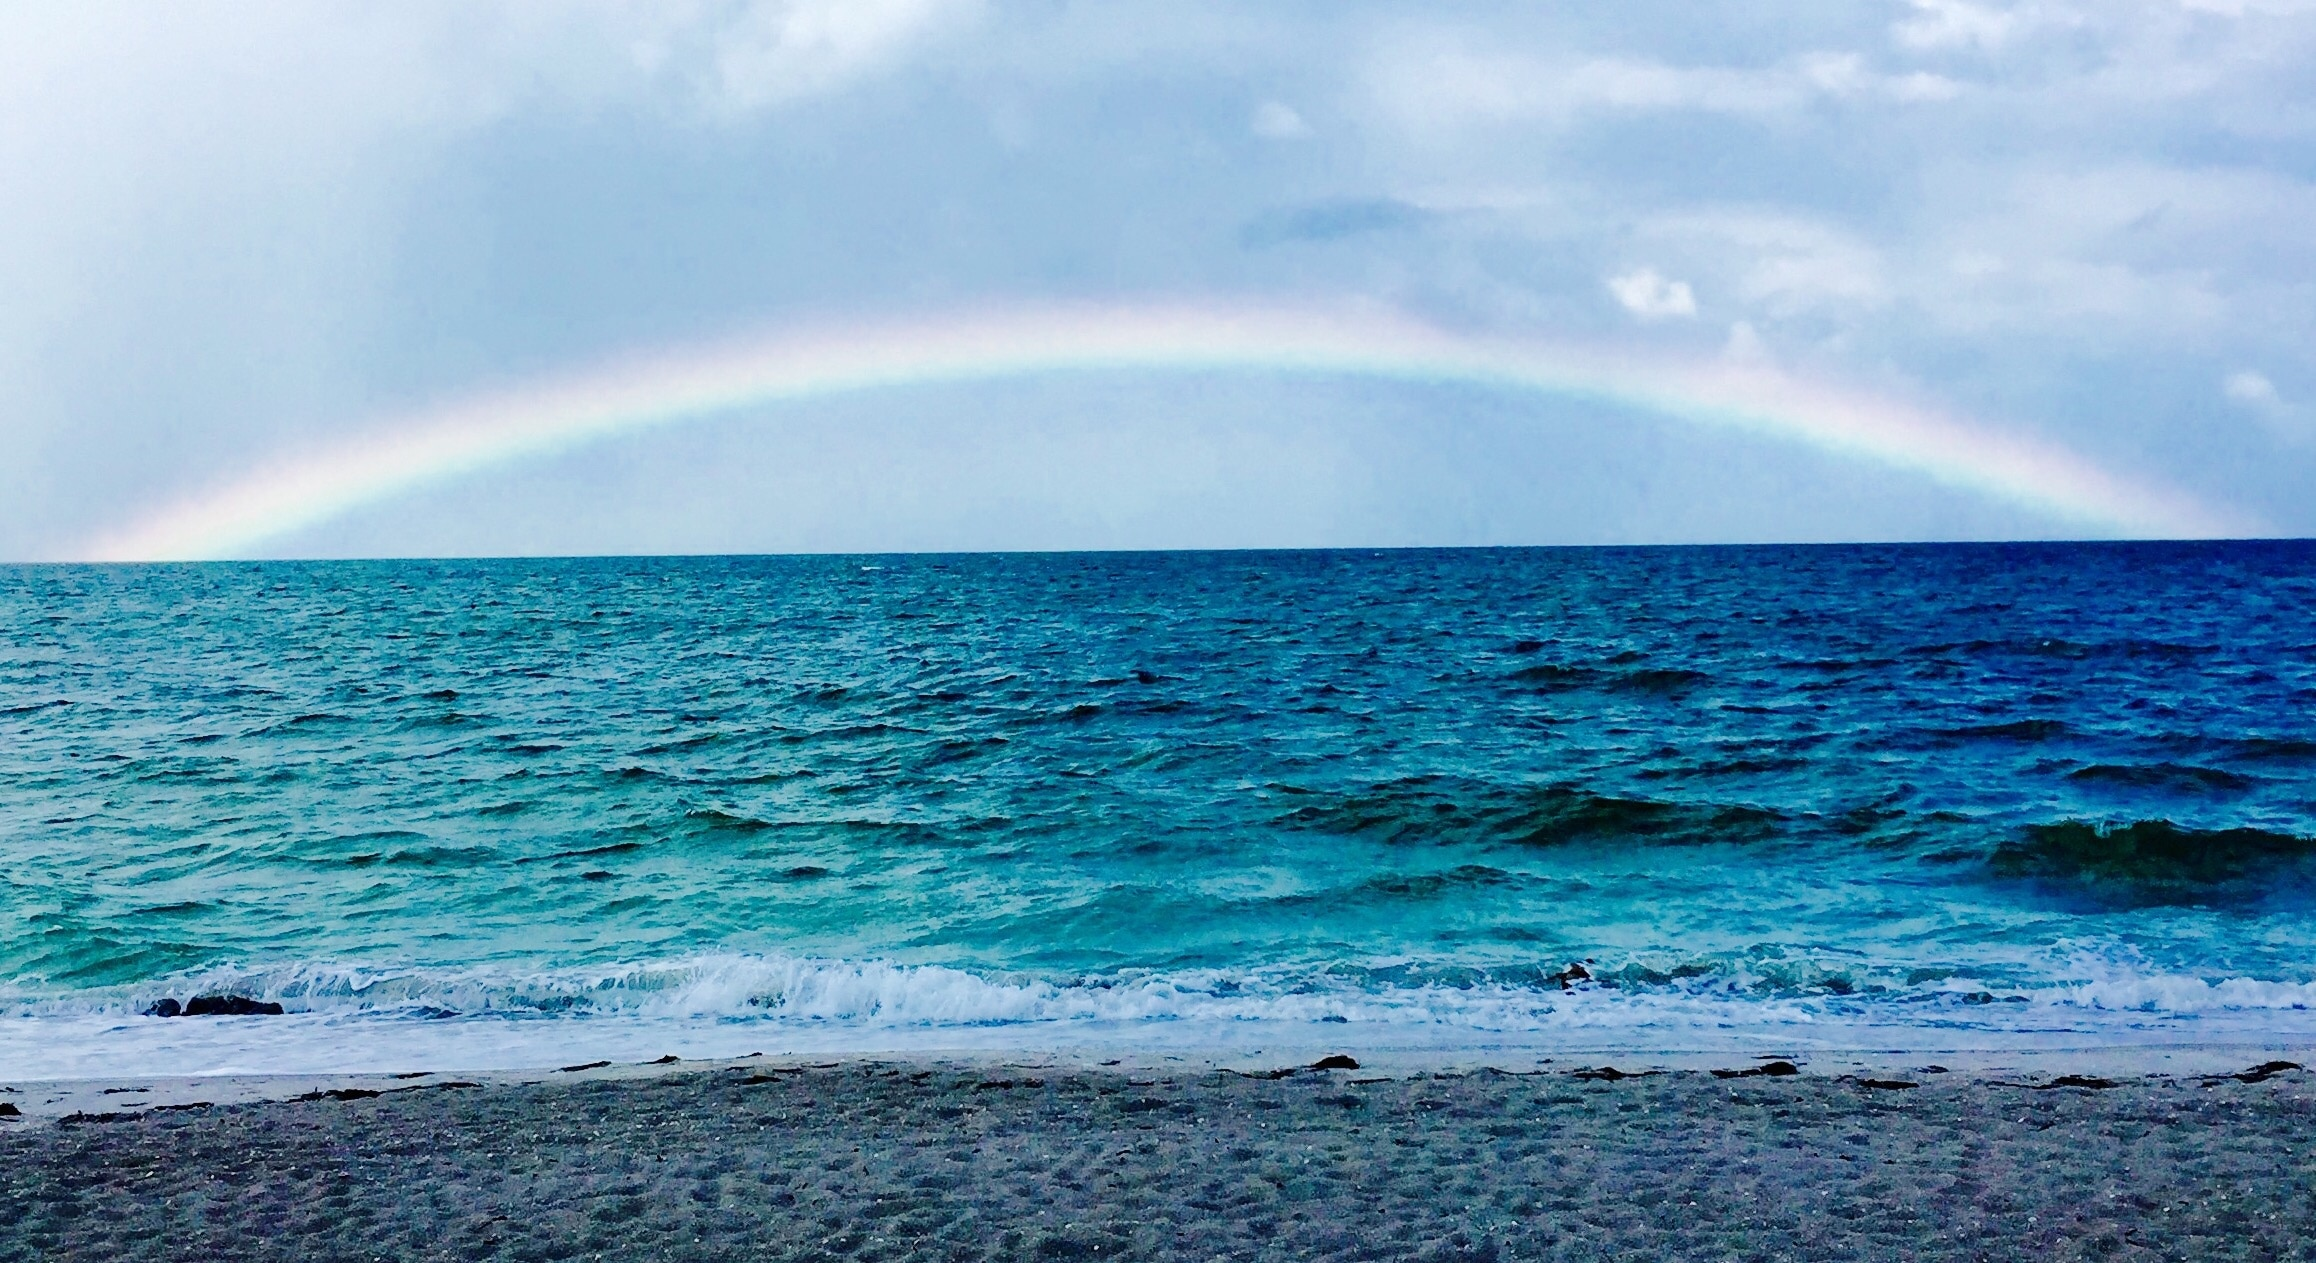 Captiva Island, Florida, United States of America